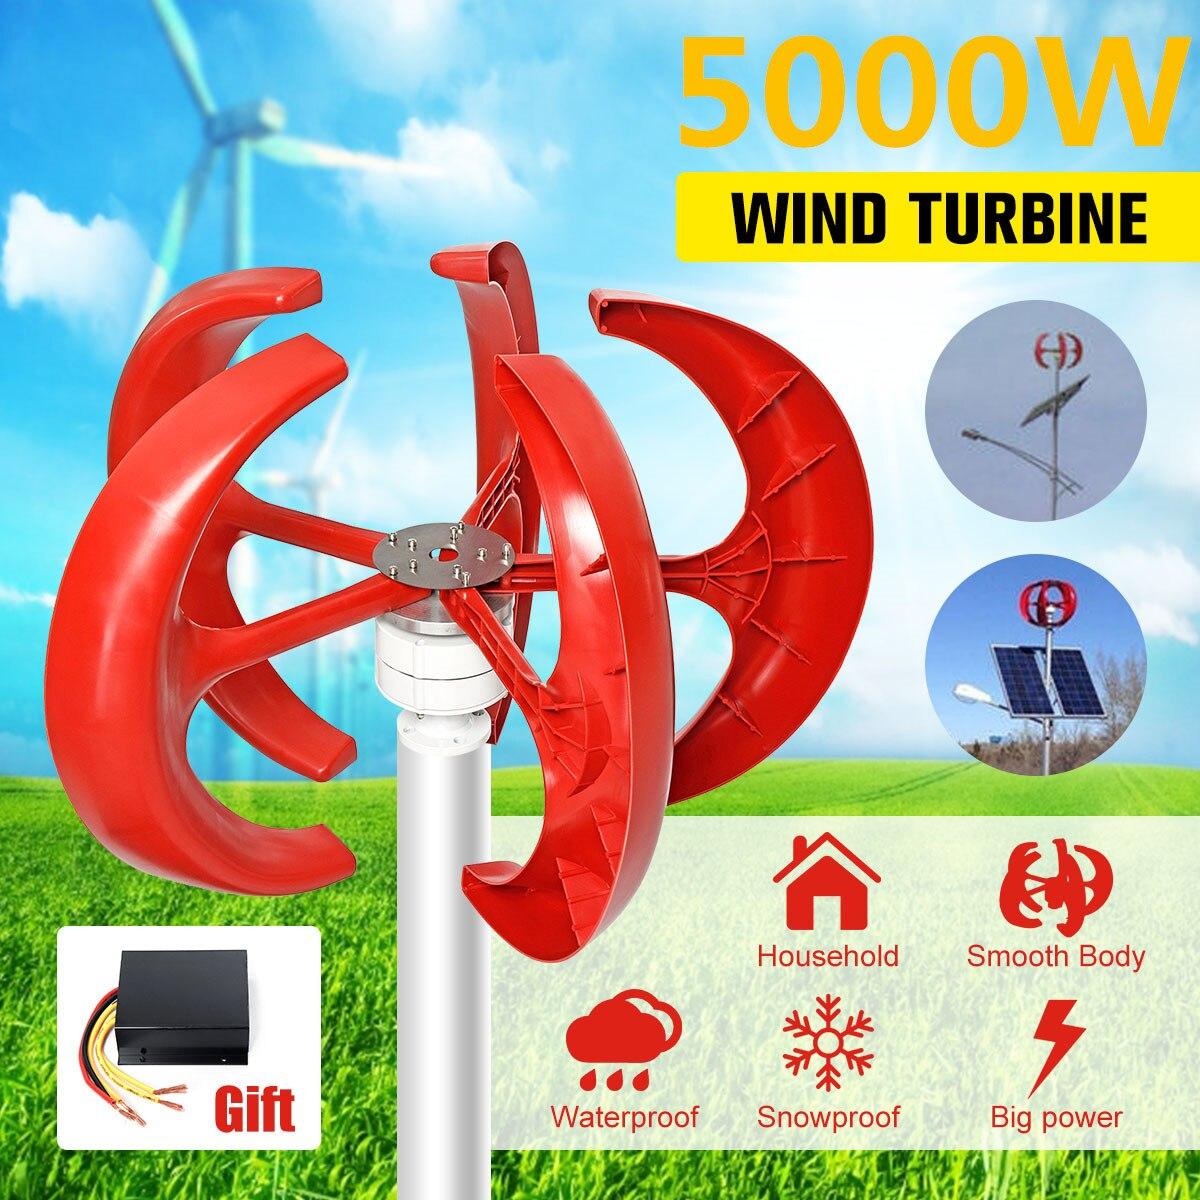 5000W AC 12V 24V Wind Turbines Generator Lantern 5 Blades Motor Kit Vertical Axi For Home Hybrids Streetlight Electromagnetic